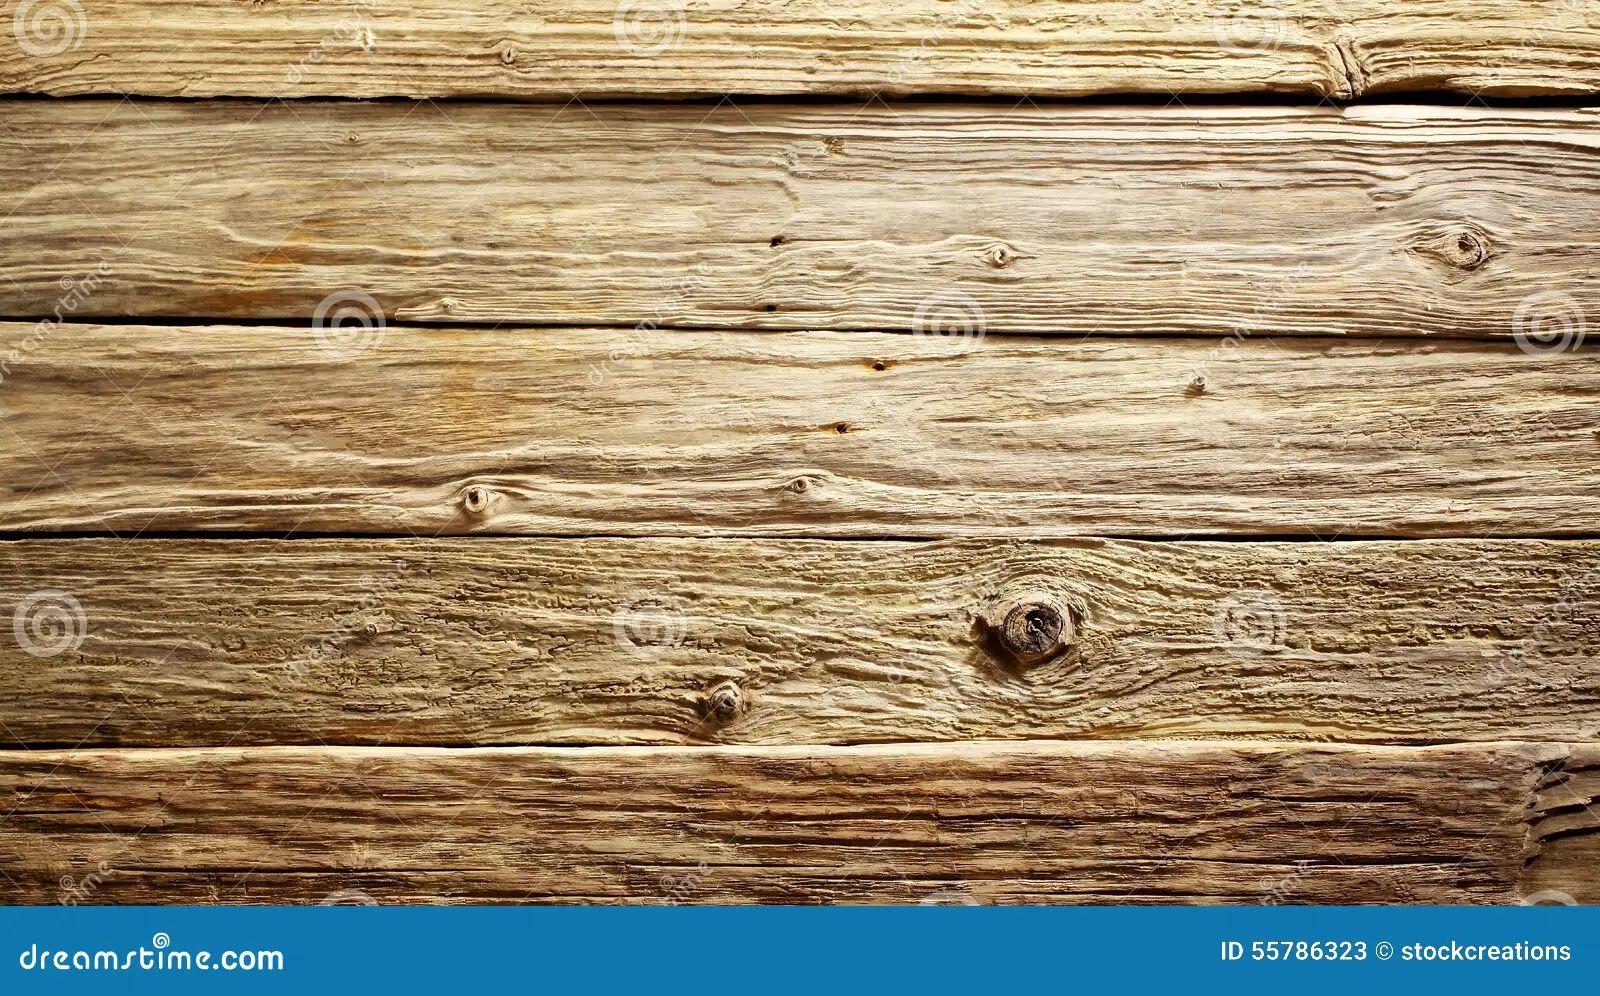 Wood table background hd - Wood Table Background Hd Wooden Table Background Pattern Download